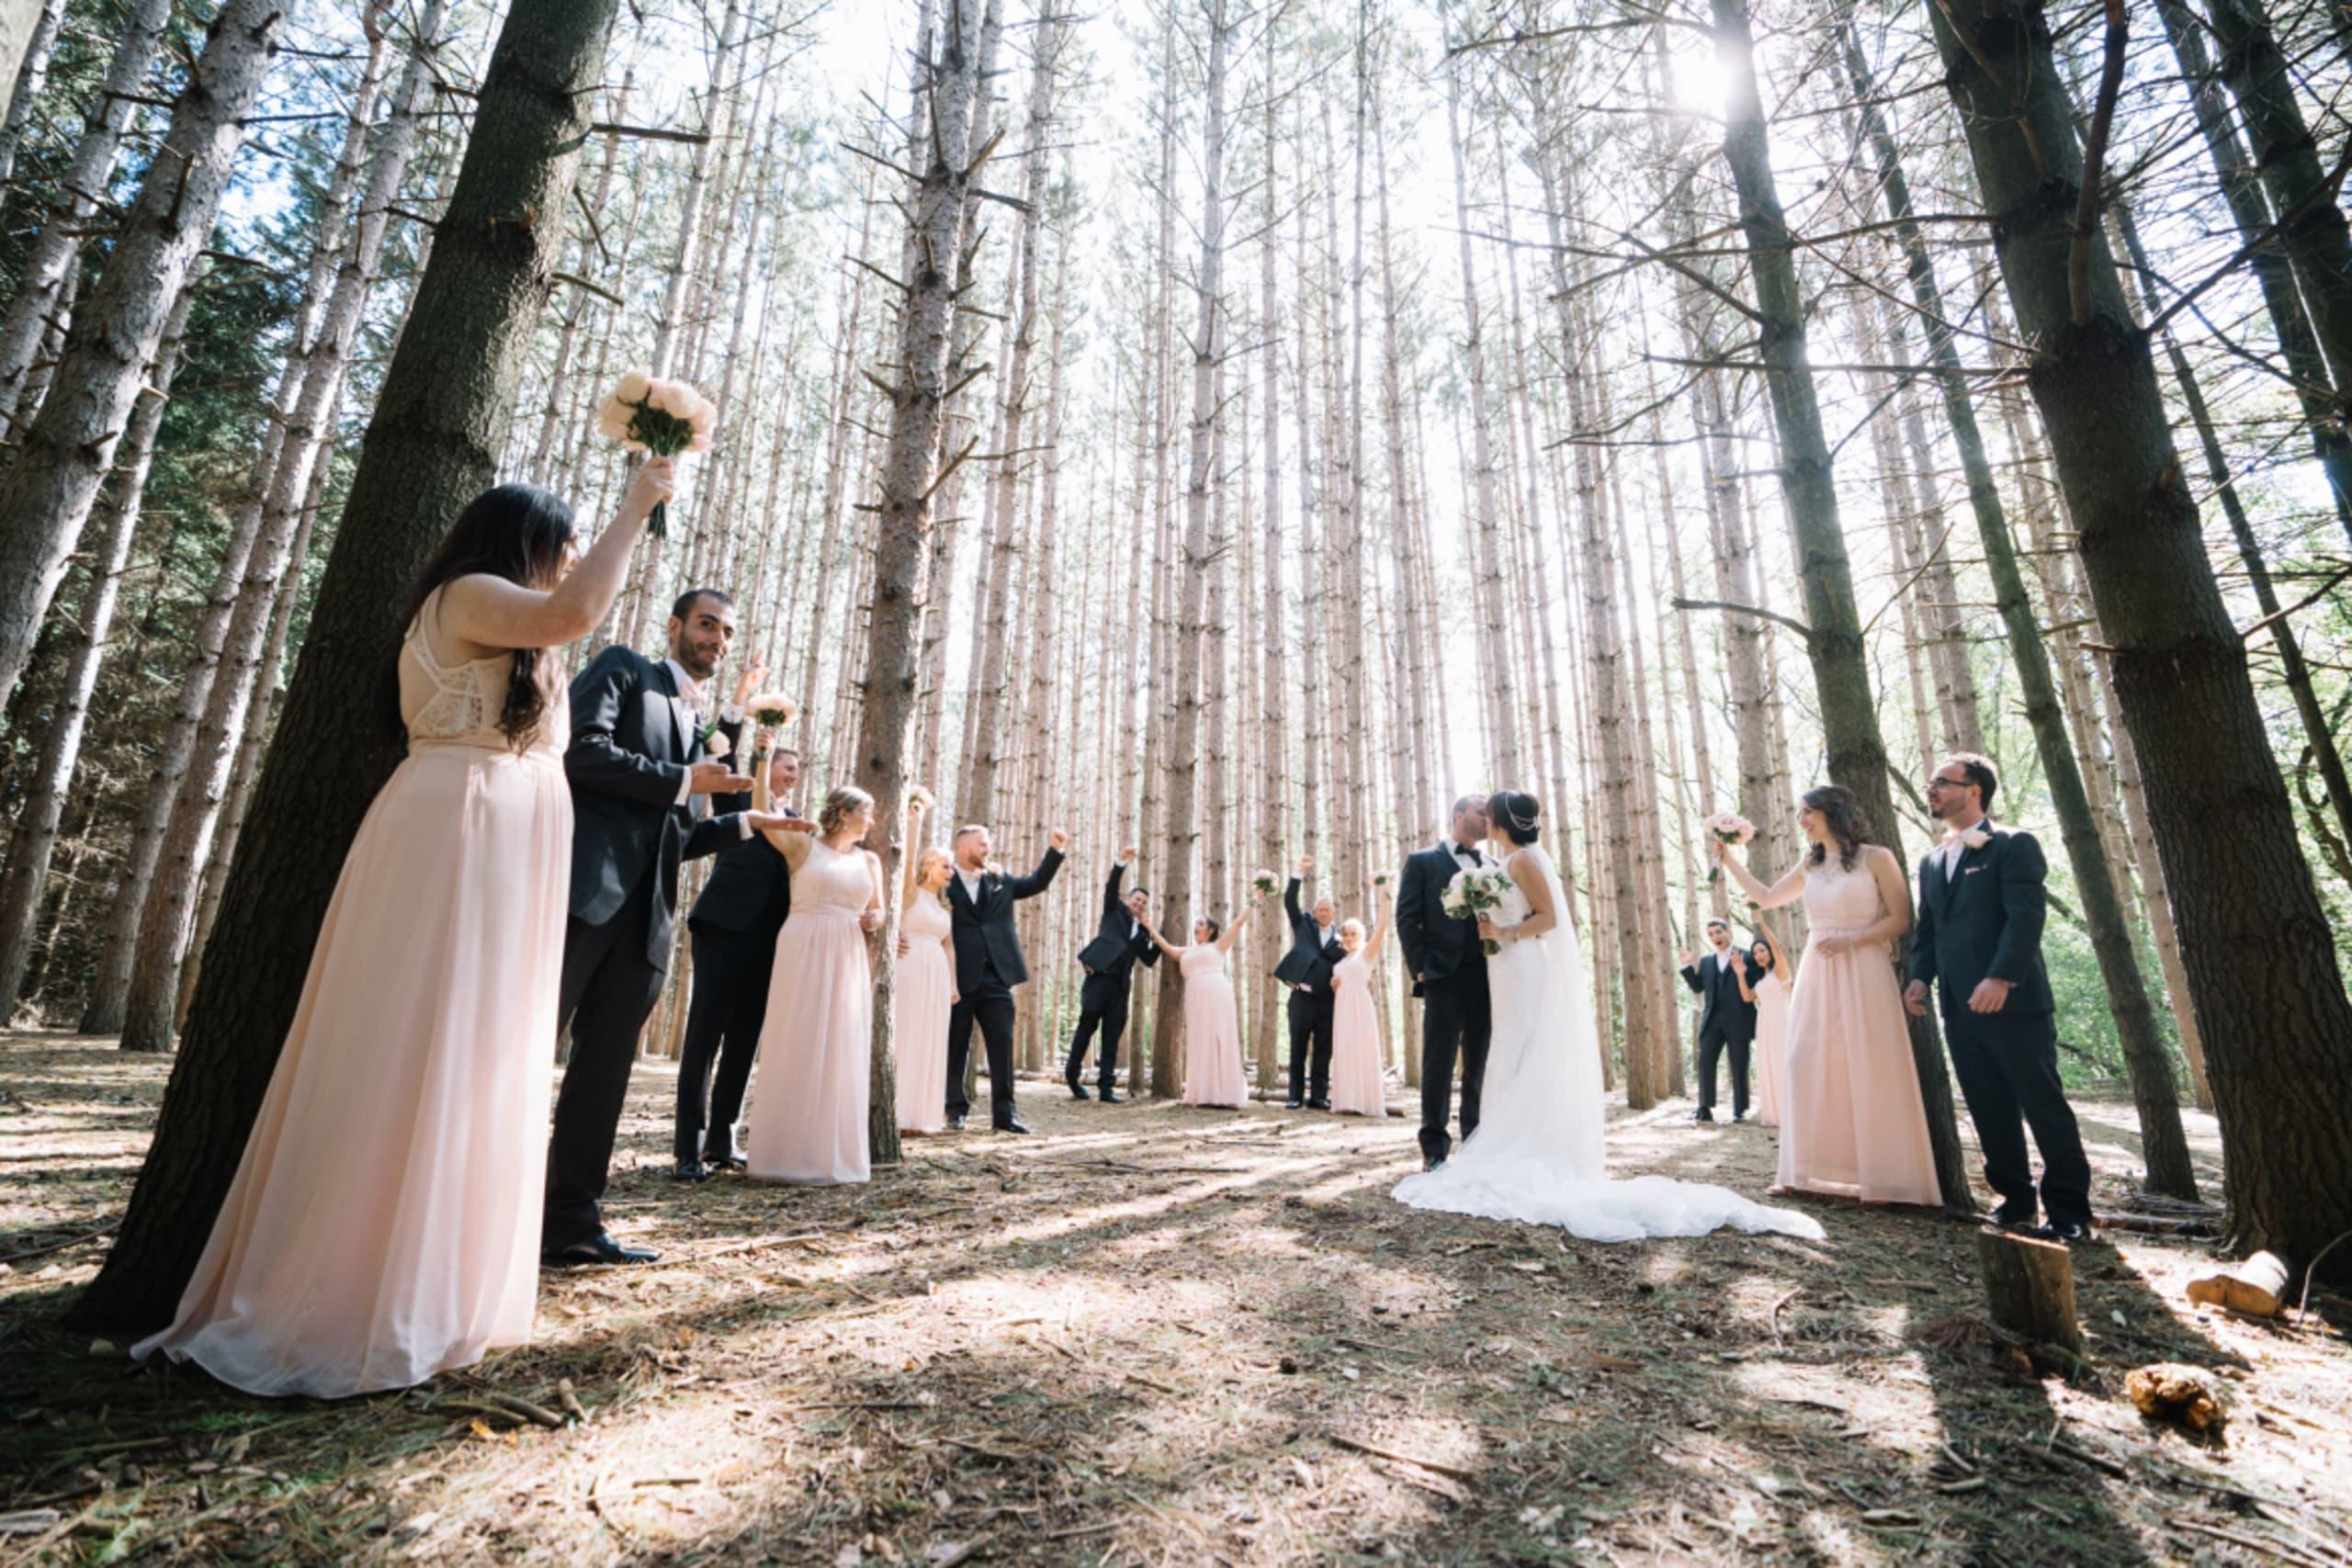 Hamilton Wedding Photography from Laura's Wedding